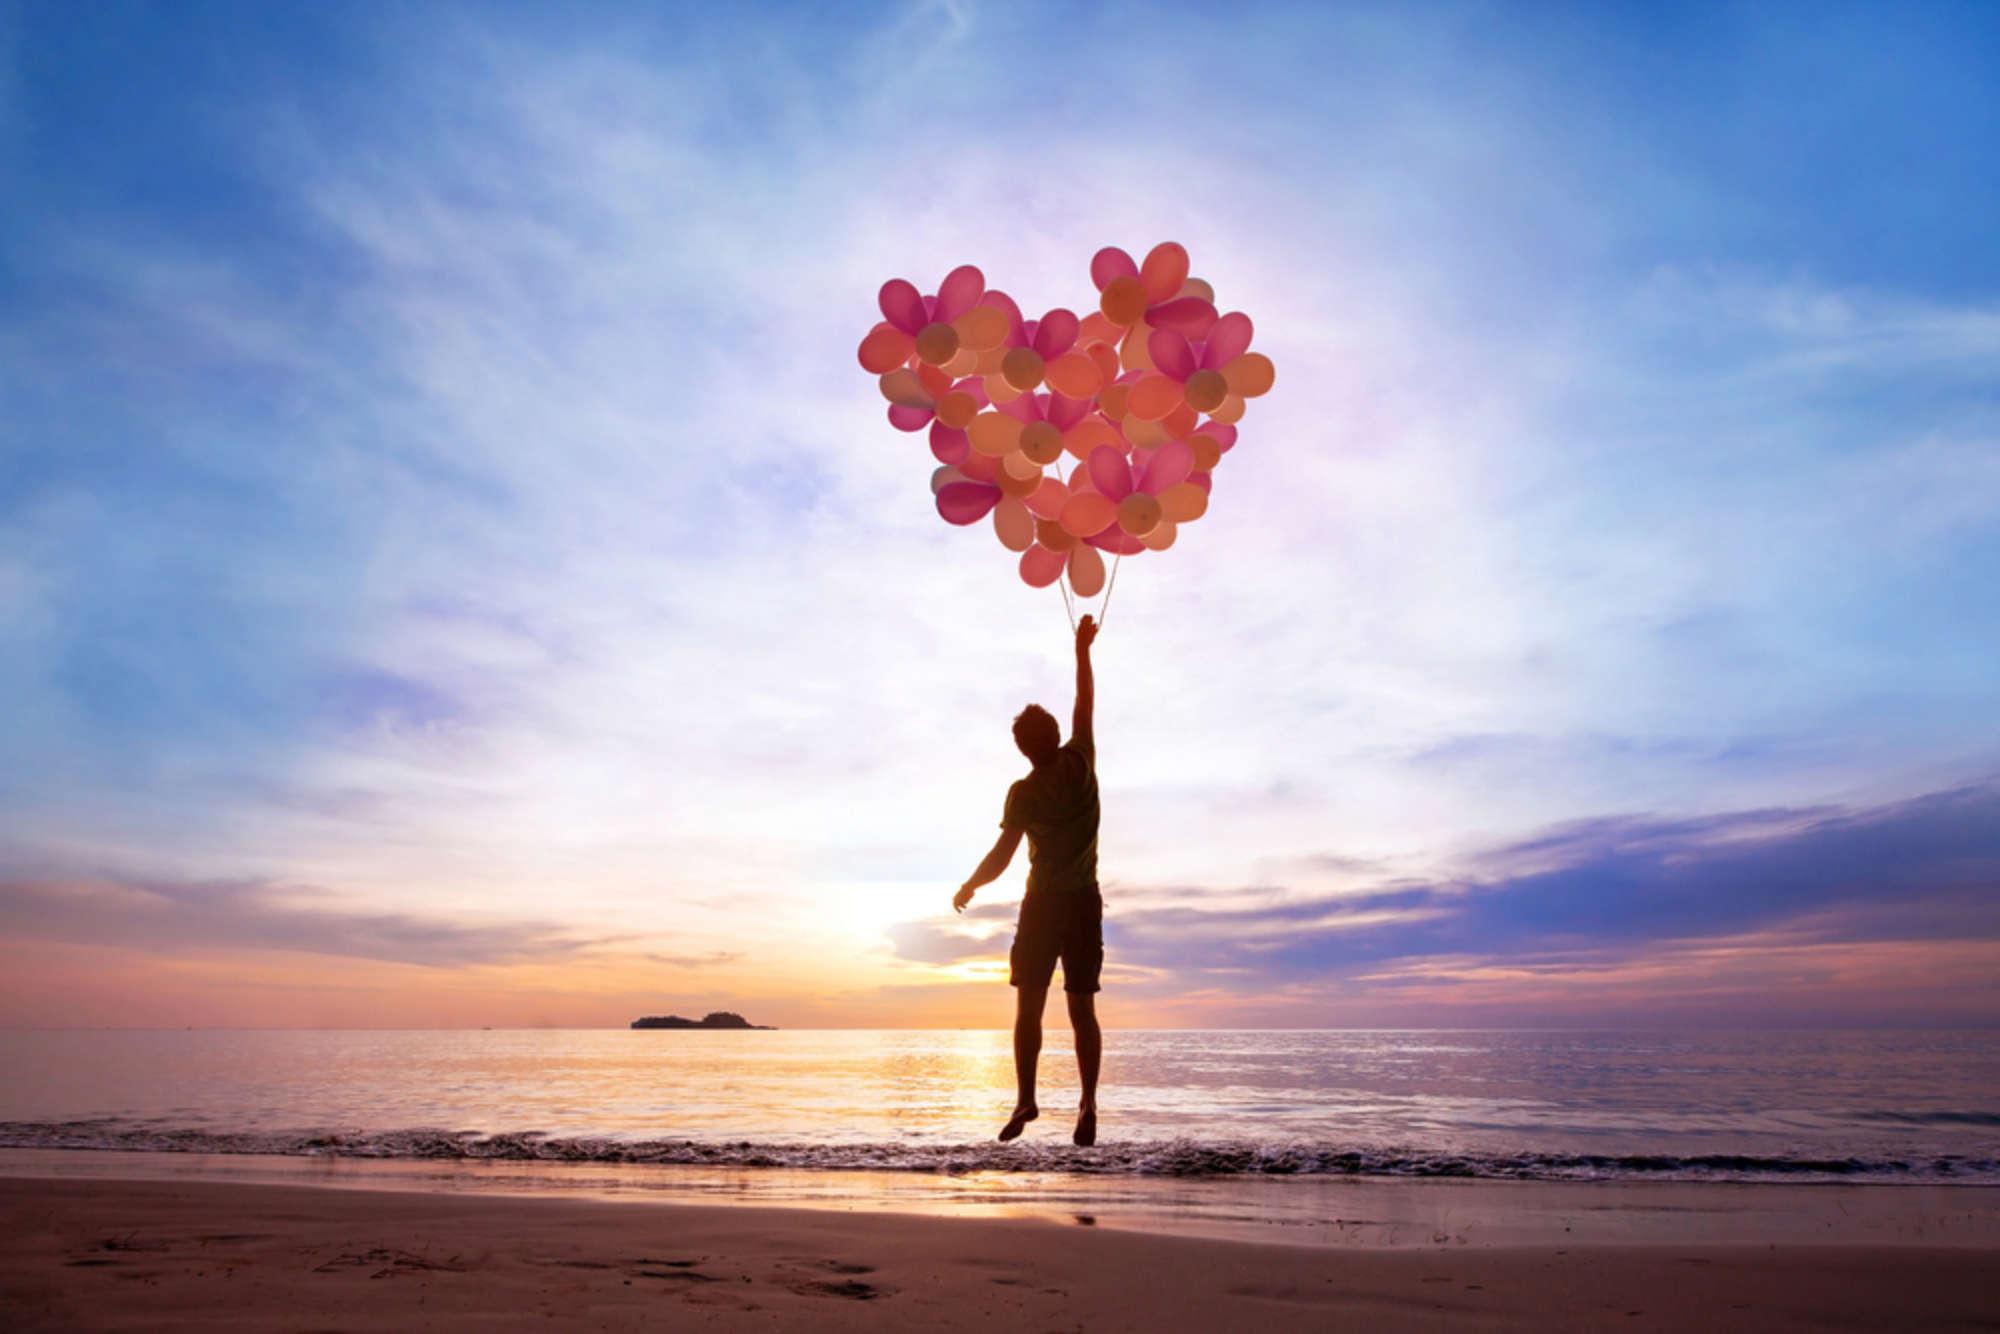 Balloons Love Light